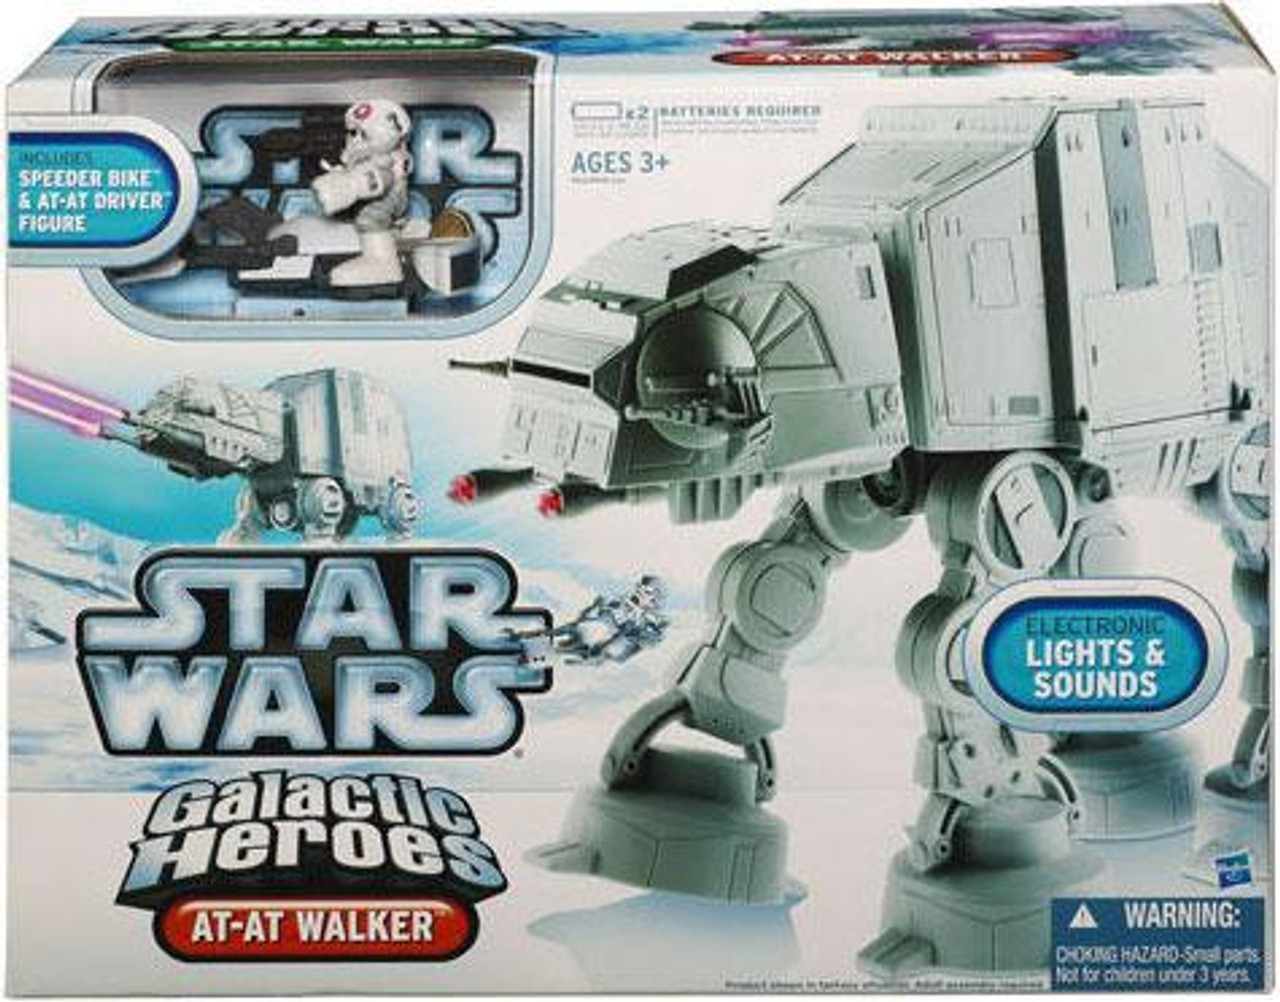 Star Wars Empire Strikes Back Galactic Heroes 2010 AT-AT Walker Mini Vehicle 2-Pack